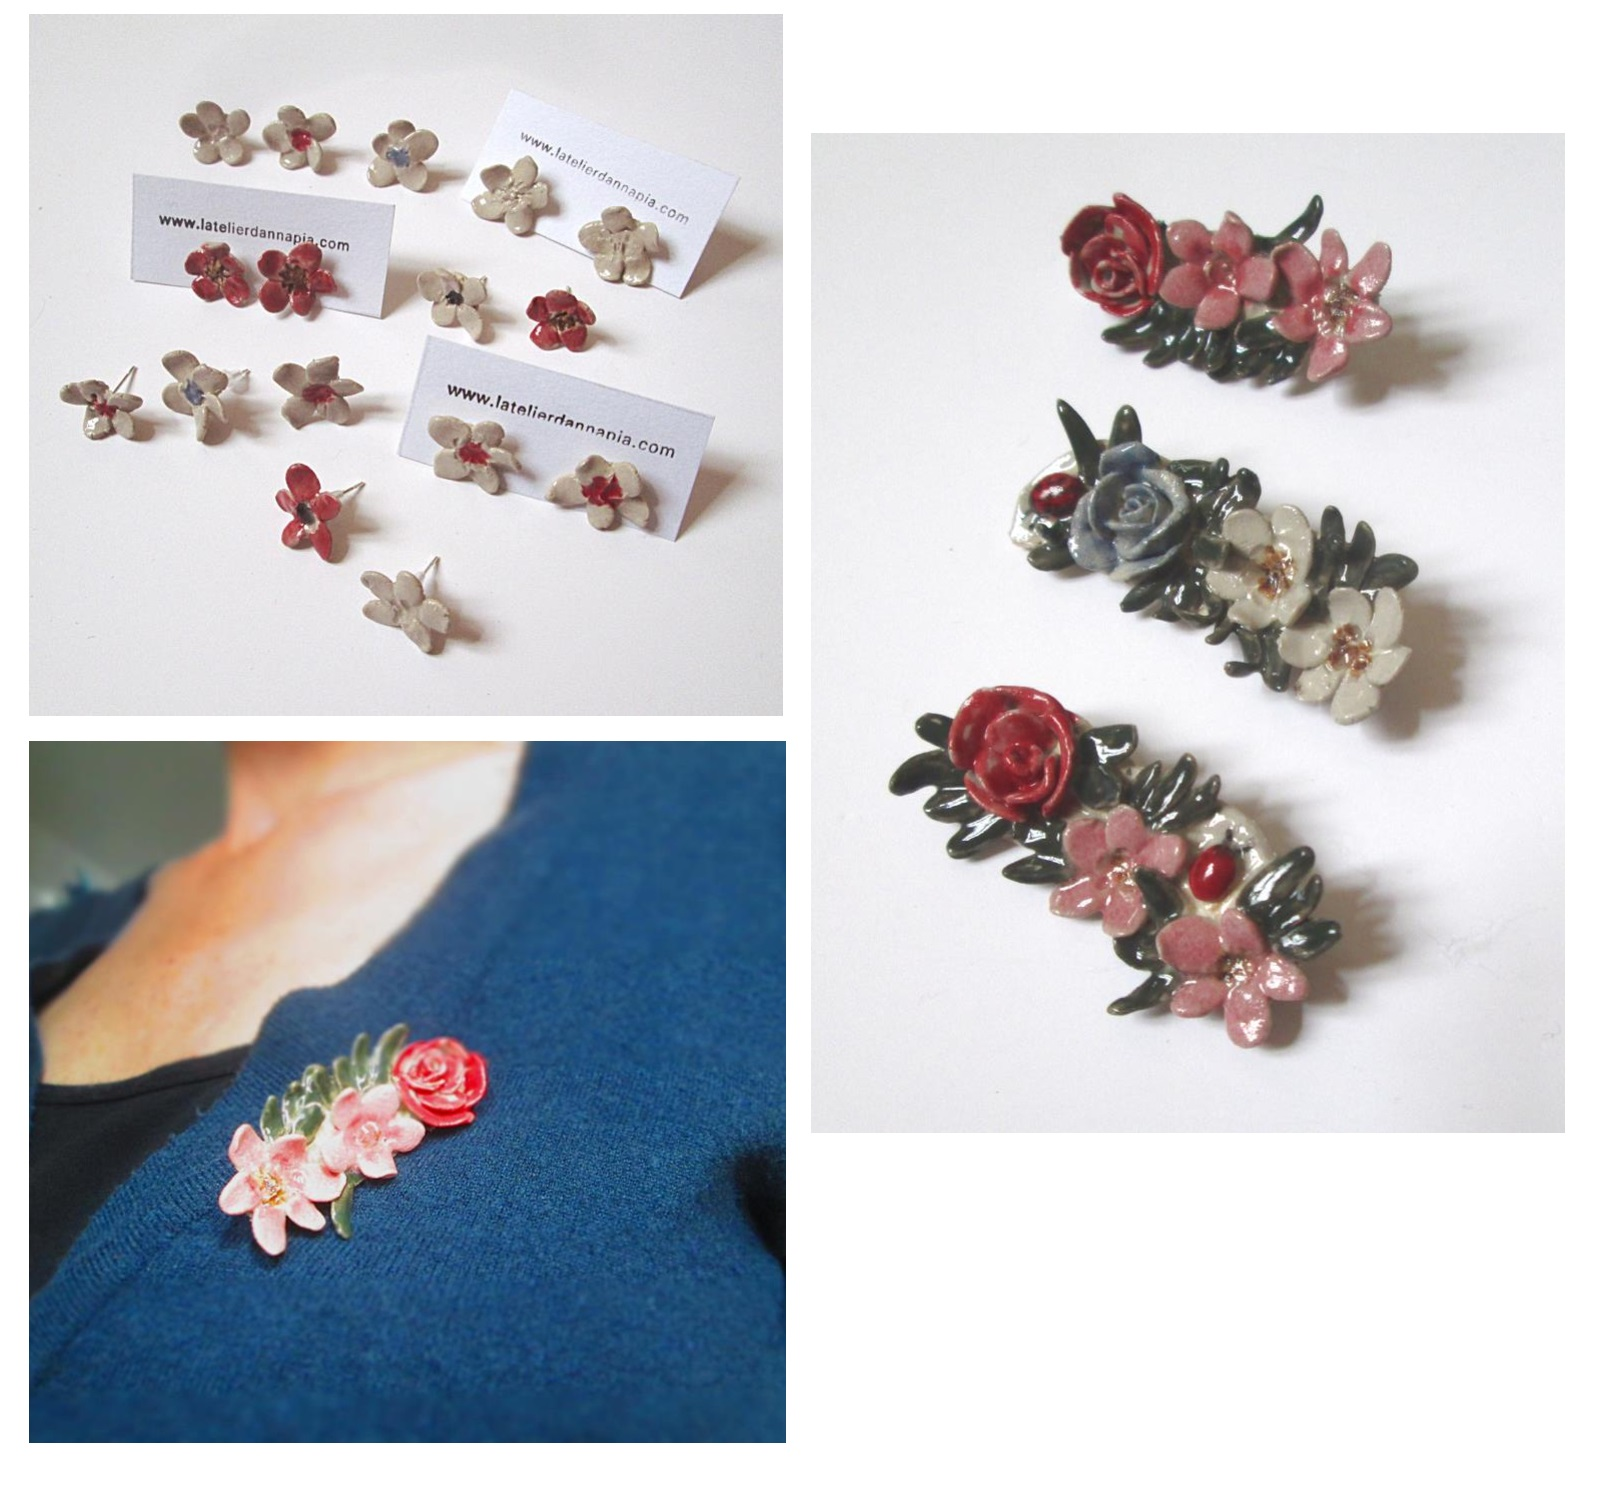 bijoux céramique fait main broches et boucles d'oreille fleurs, orecchini e spille fatti a mano in ceramica , handmade ceramic jewelery